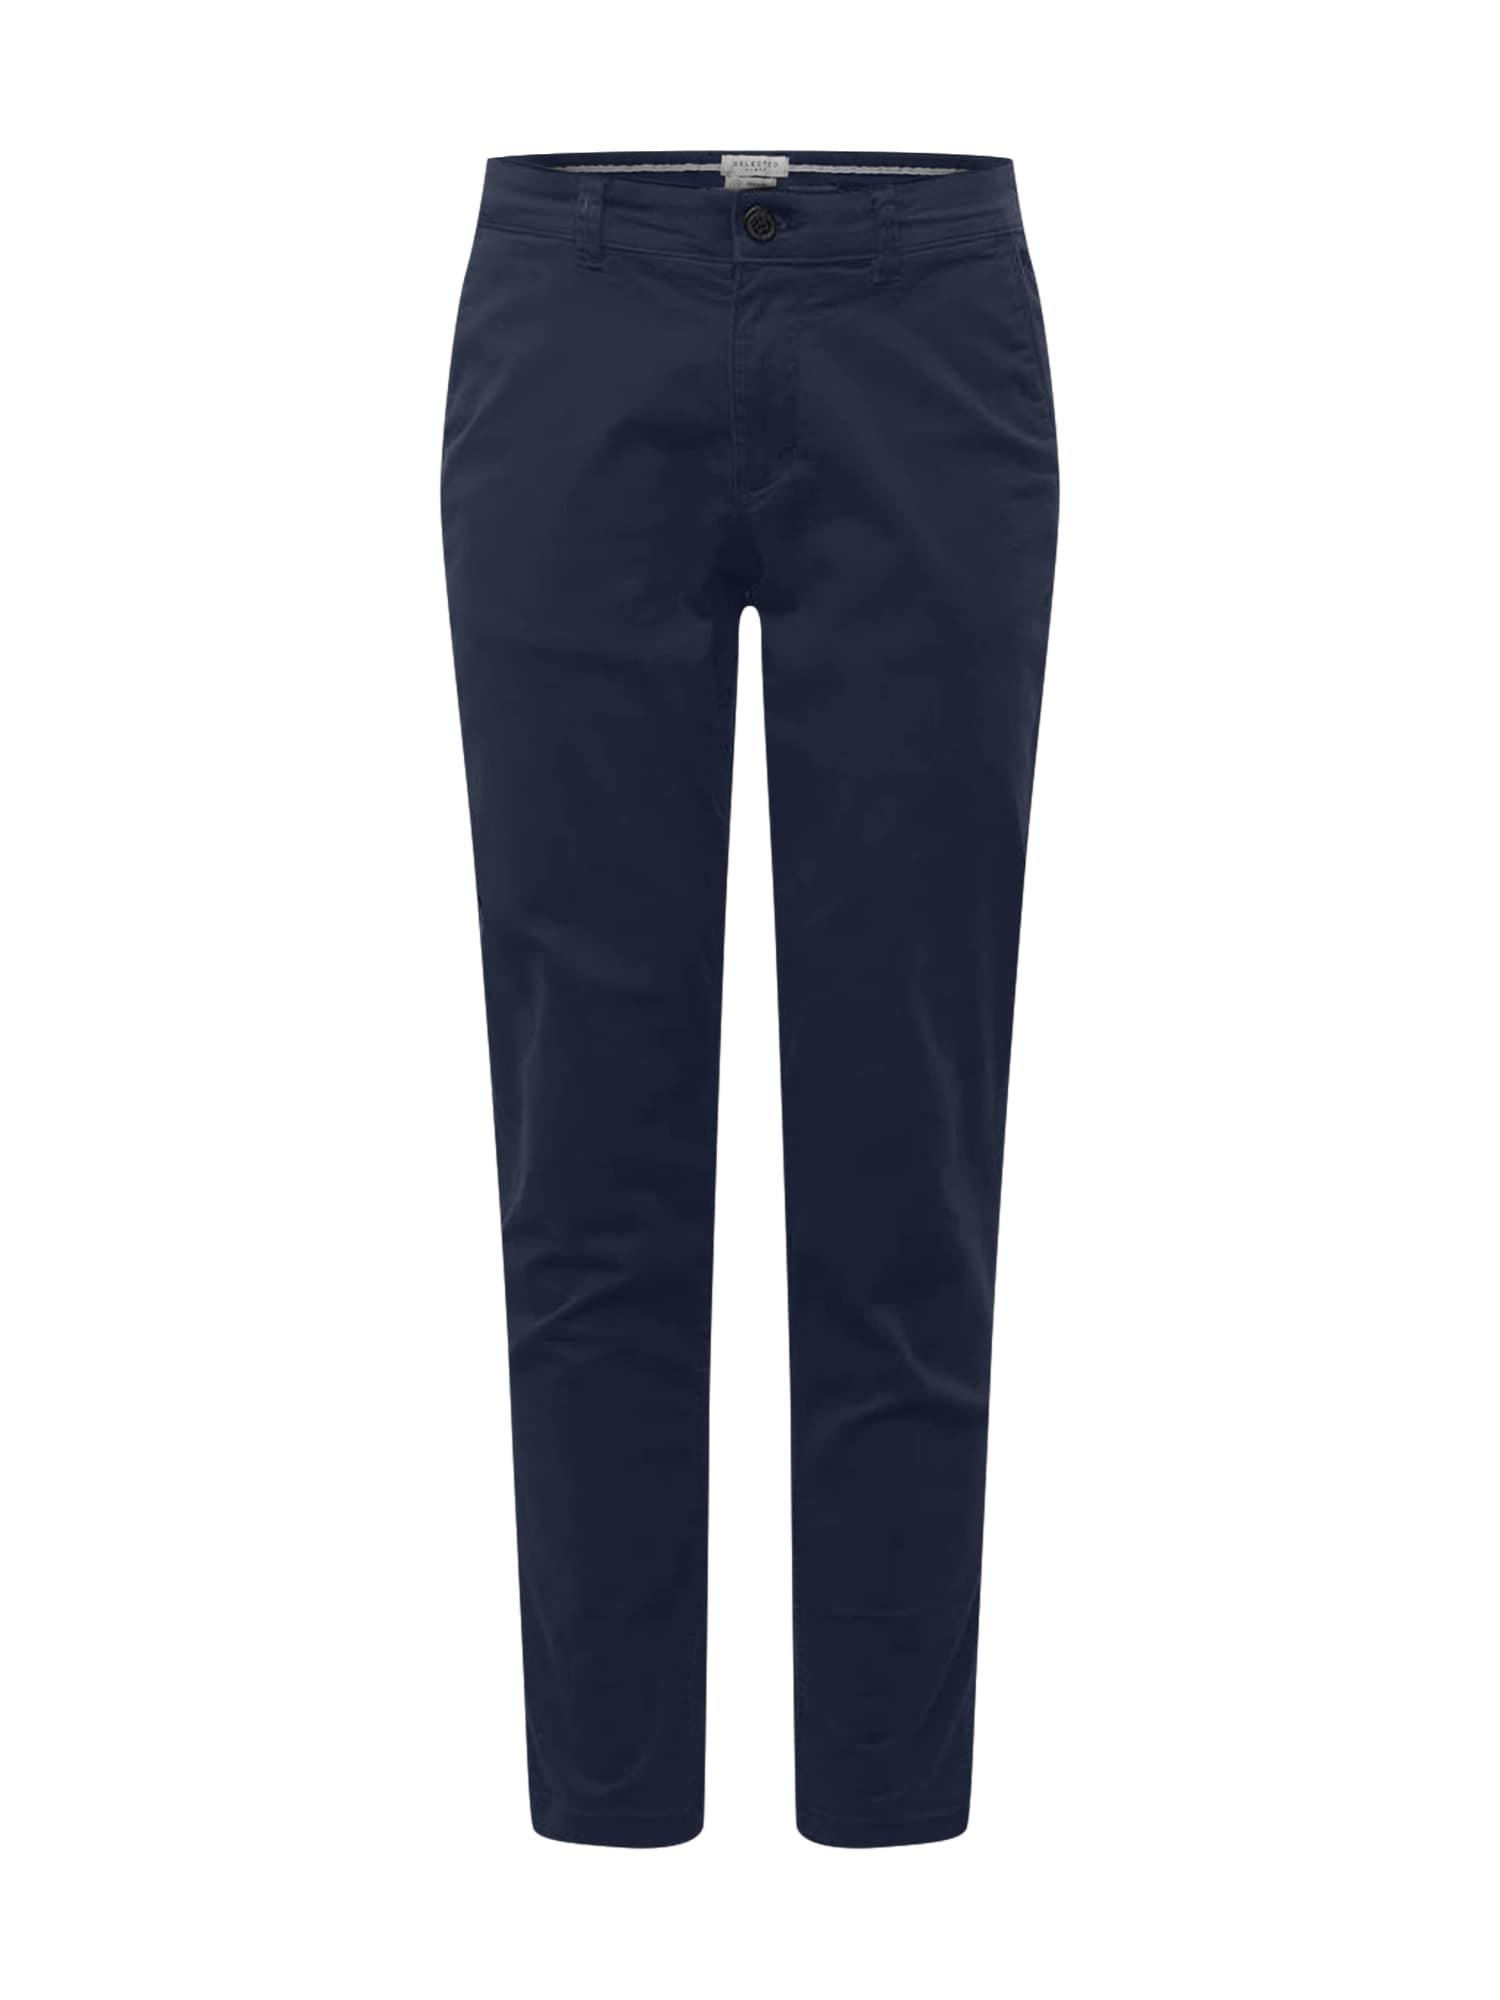 SELECTED HOMME Pantalon chino 'NEW PARIS'  - Bleu - Taille: 38 - male